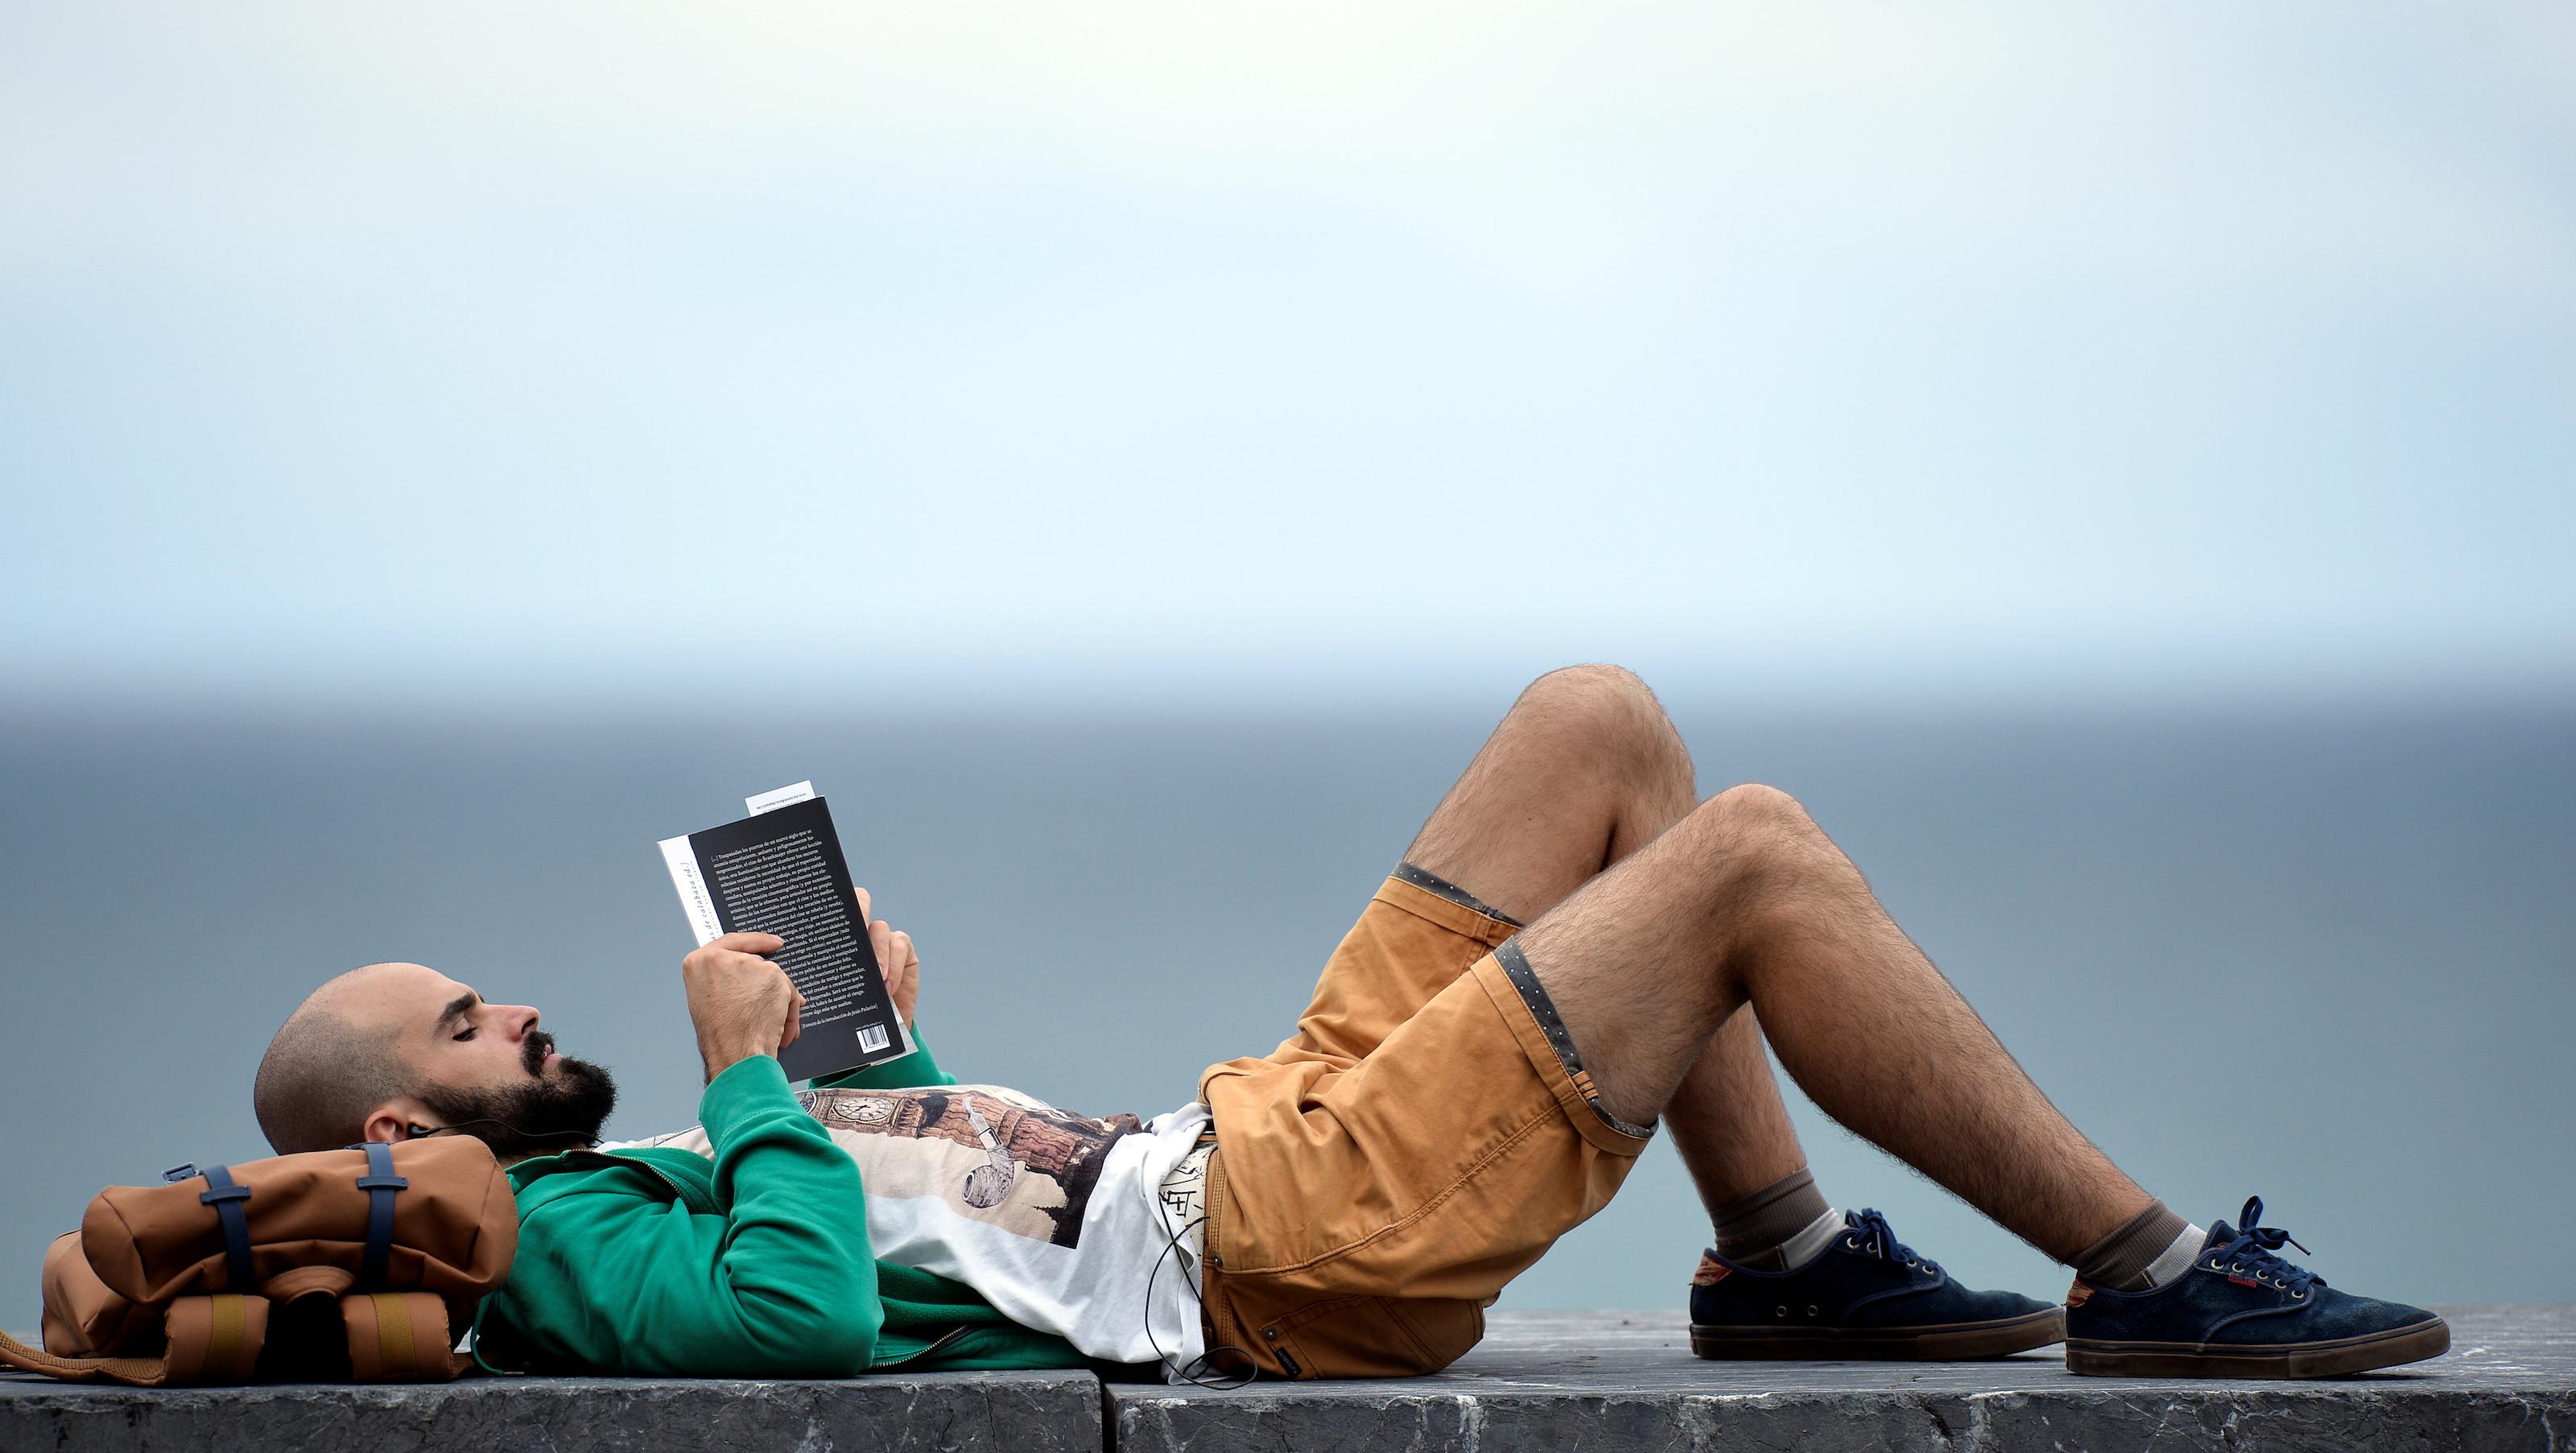 A man reads a book near a photocall at the San Sebastian Film Festival in San Sebastian, Spain, September 22, 2017. REUTERS/Vincent West - RC15570C3460